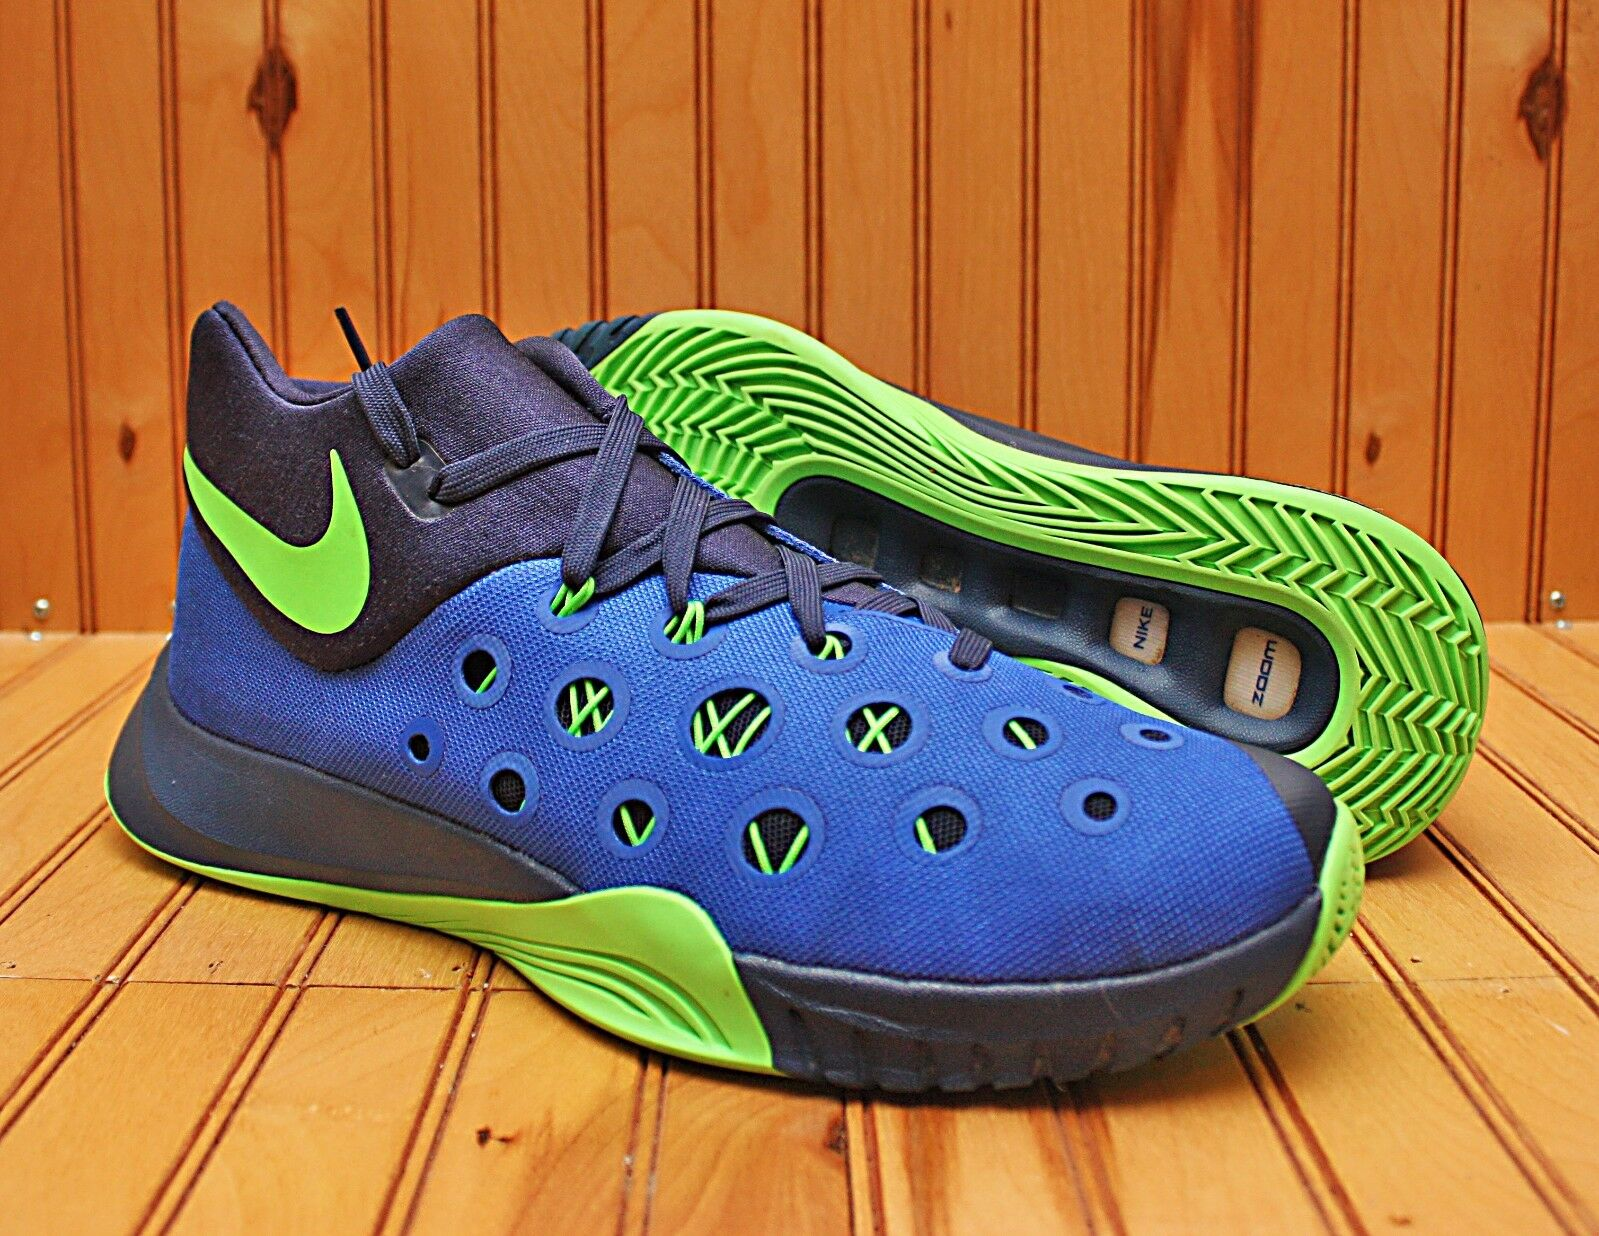 Nike zoom hyperquickness 2015 taglia 10 - royal royal - blue navy verde sprite - 749882 434 28e6e8